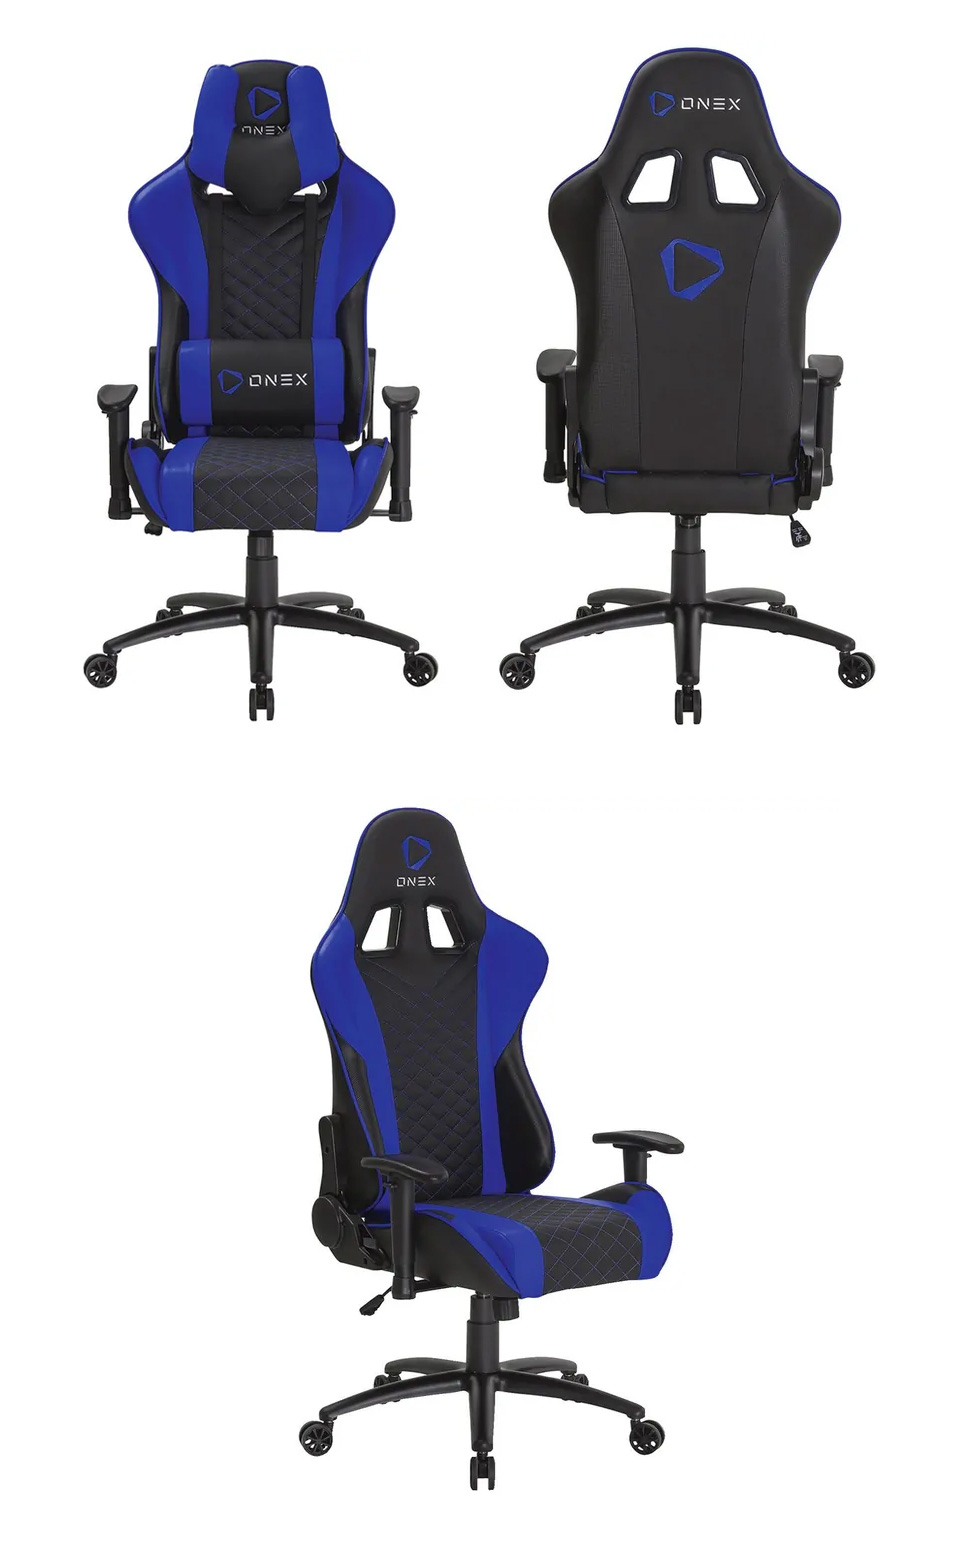 ONEX GX3 Gaming Chair Black Navy product